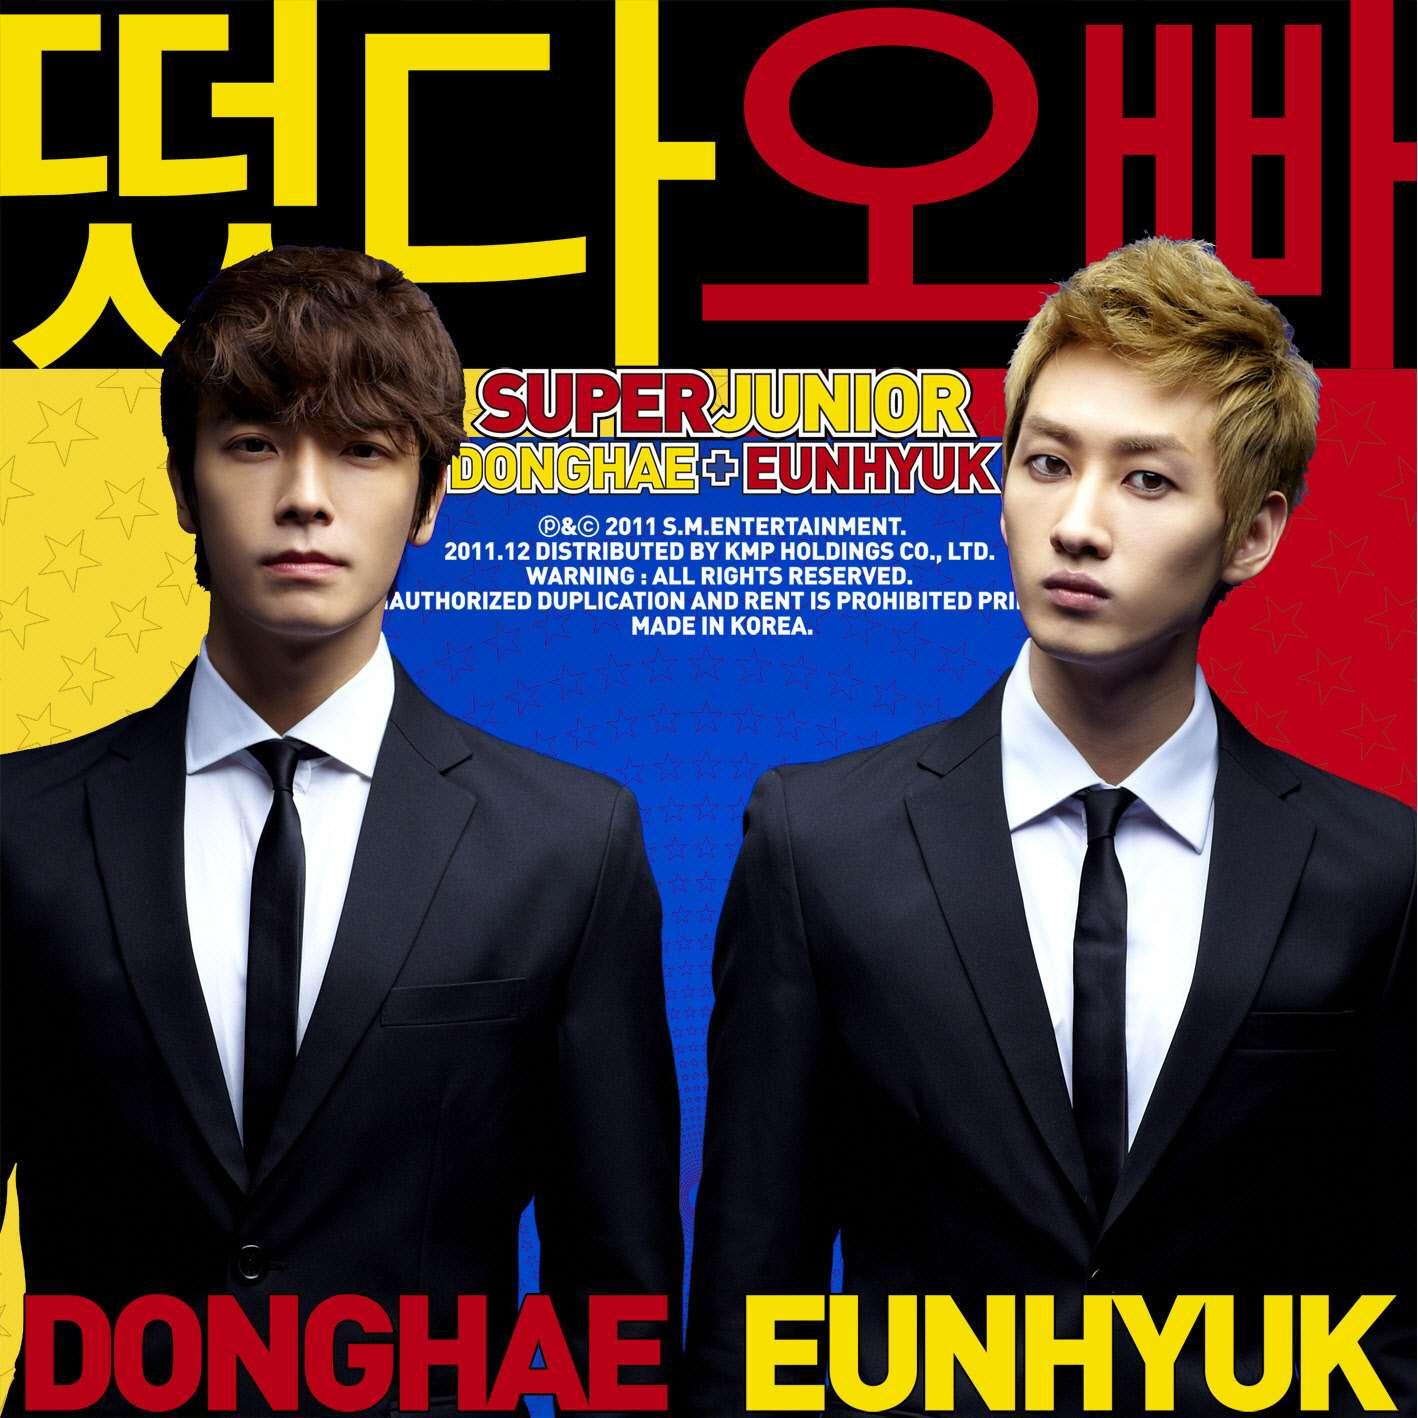 [Single] Super Junior (Donghae & Eunhyuk) - 떴다 오빠 (Oppa, Oppa)